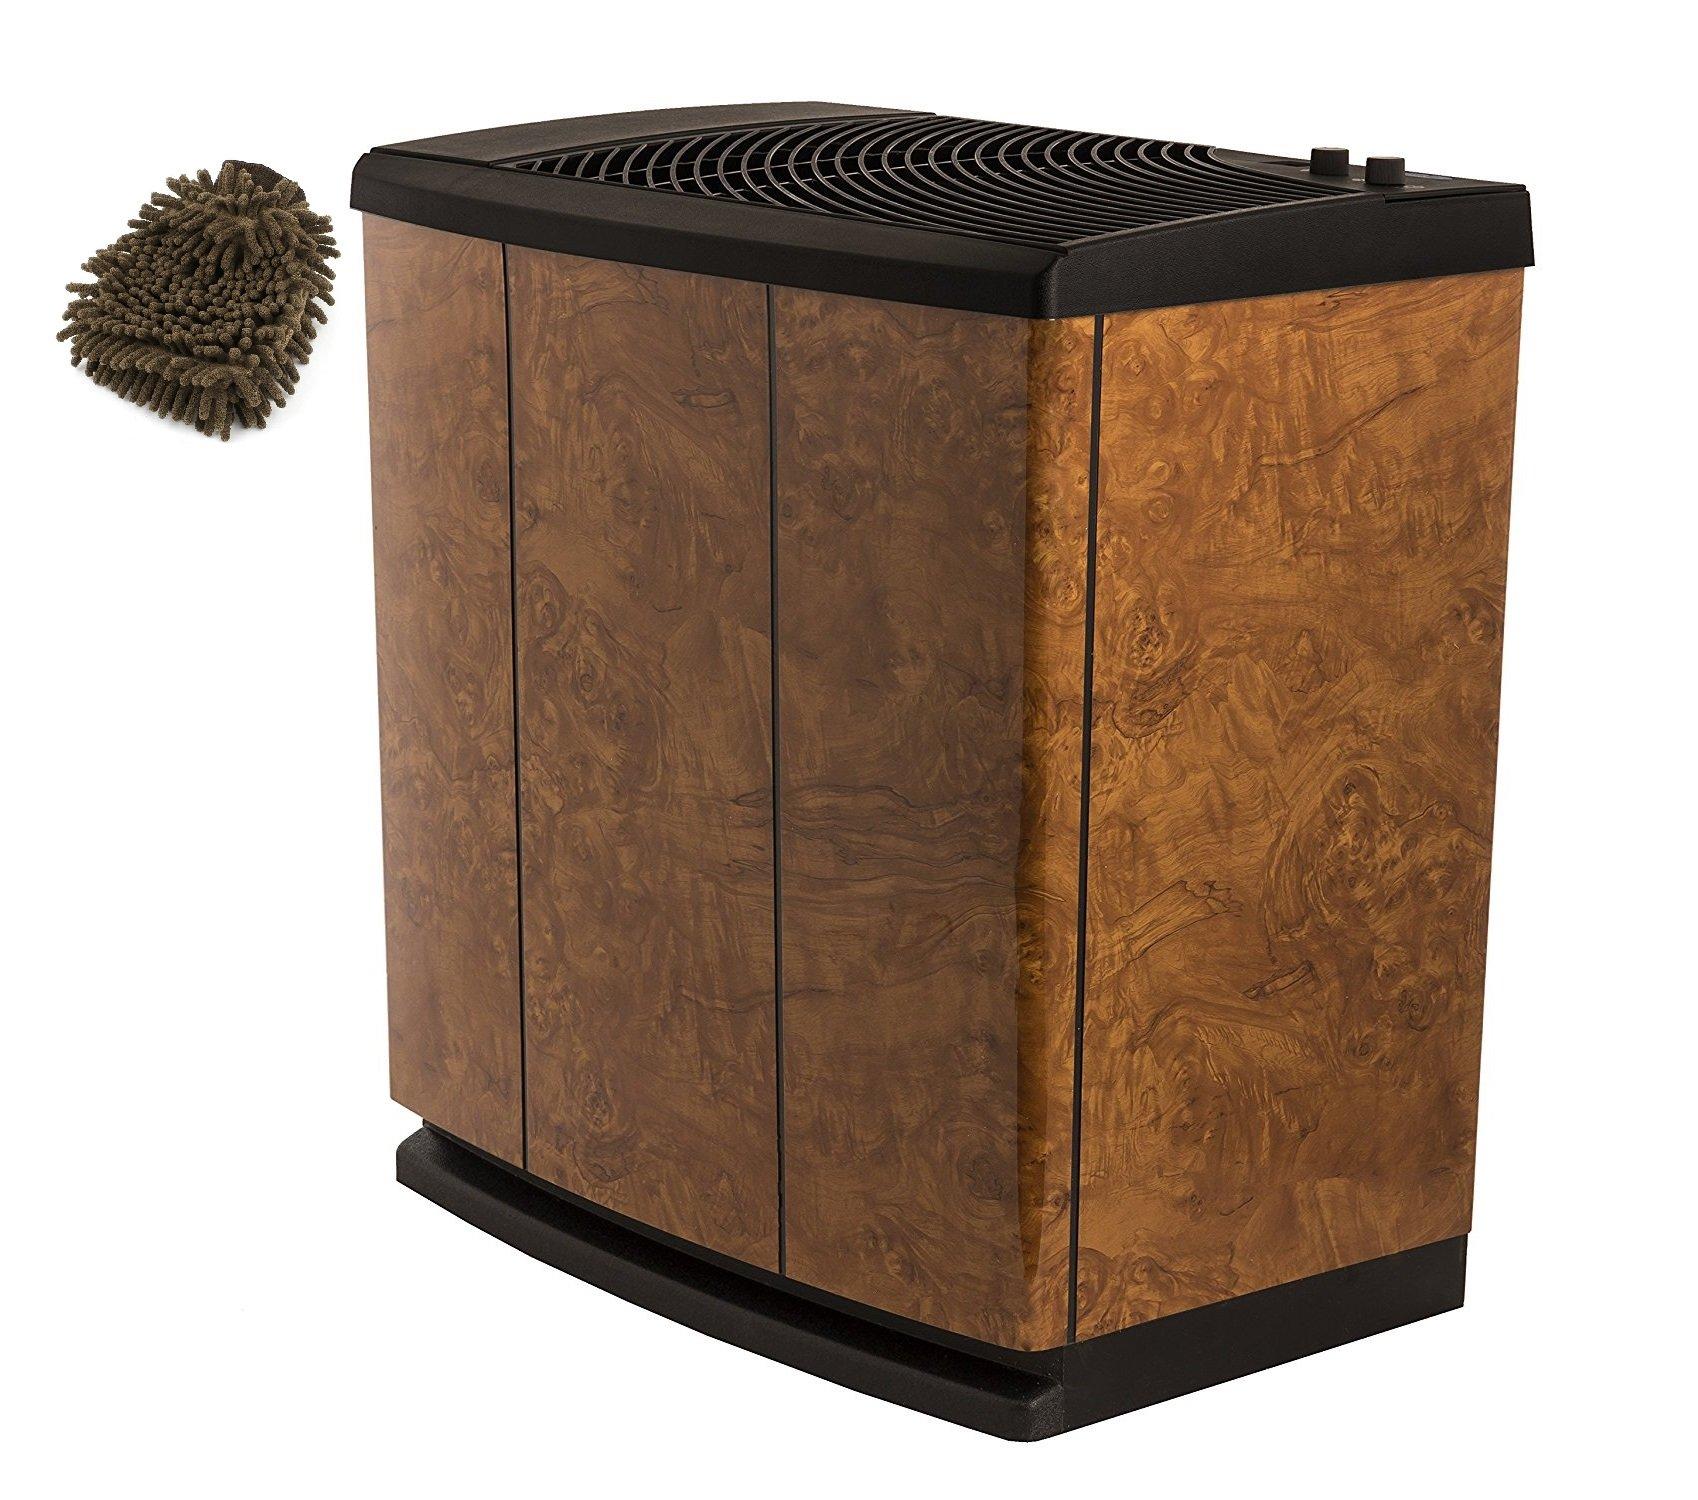 H12-400HB AIRCARE Evaporative Whole-House Humidifier, 3-Speed Console-Style, Oak Burl (Complete Set) w/ Bonus: Premium Microfiber Cleaner Bundle